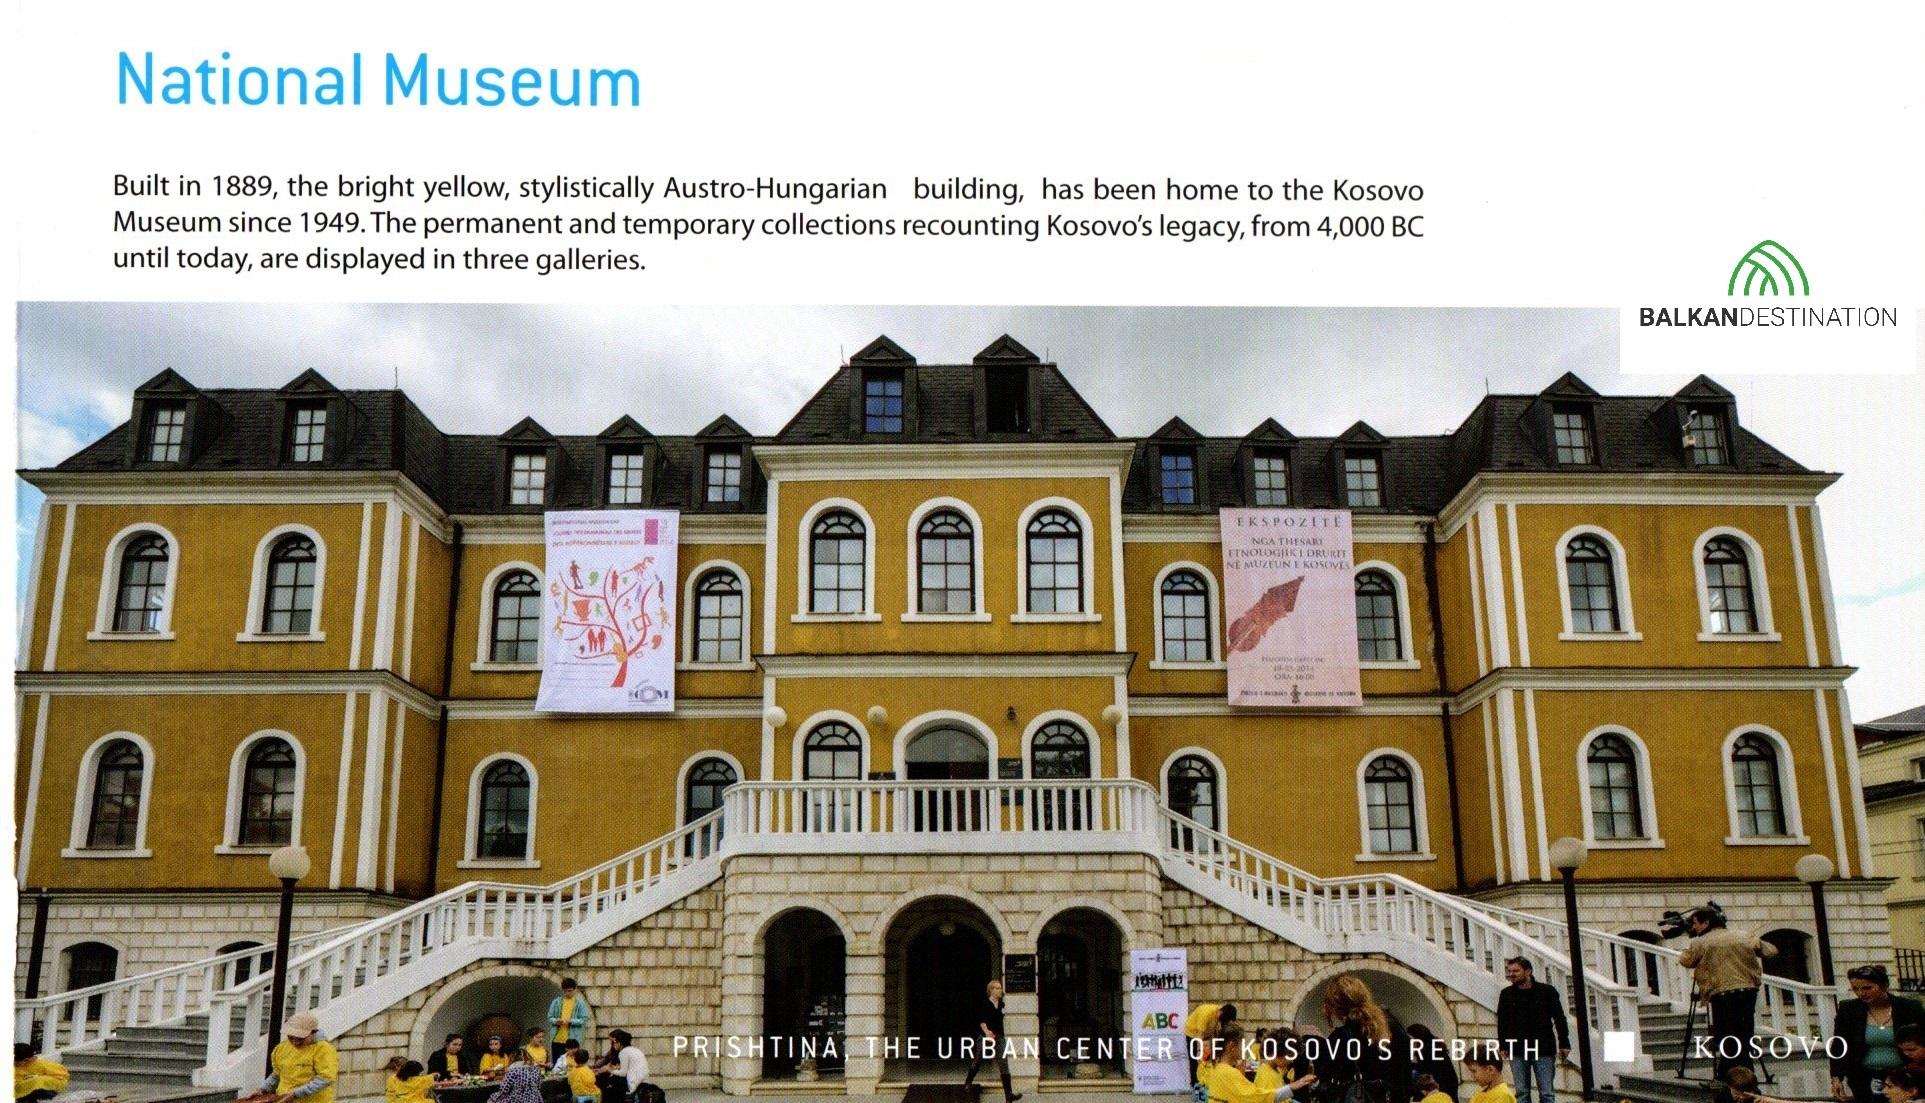 balkandestination nationalmuseum pristina kosovo